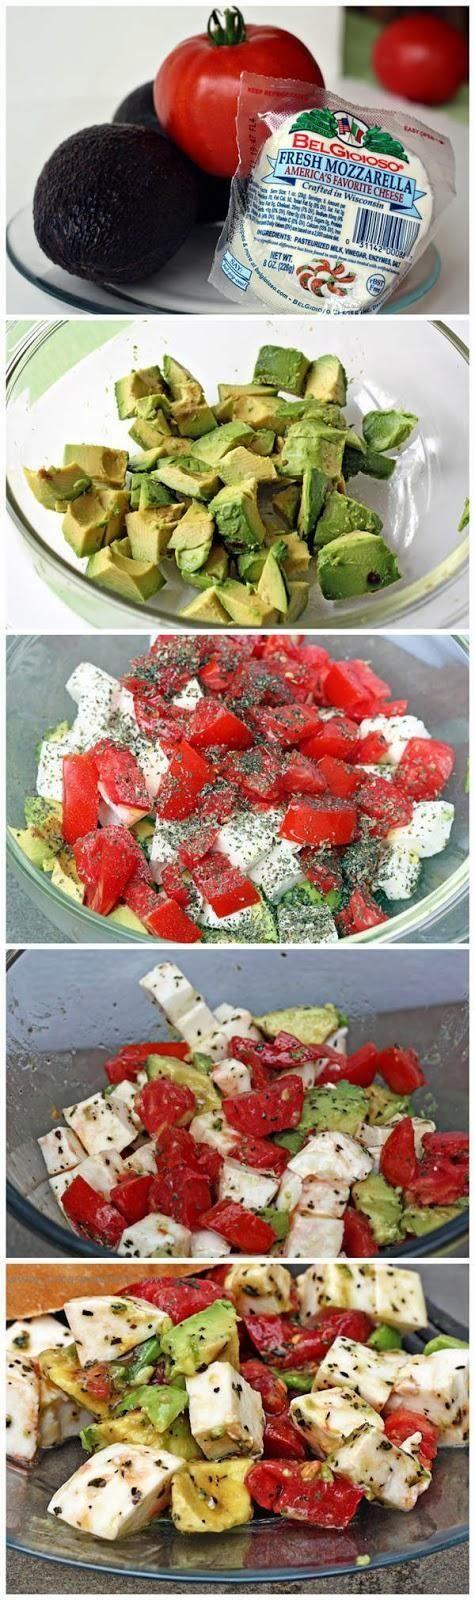 Avocado / Tomato/ Mozzarella Salad - Luxury Lifestyle, DIY Crafts, Fashion, Travel Photos, Healthy and Glutton Free Diabetic Recipes - Fashion's Most Wanted